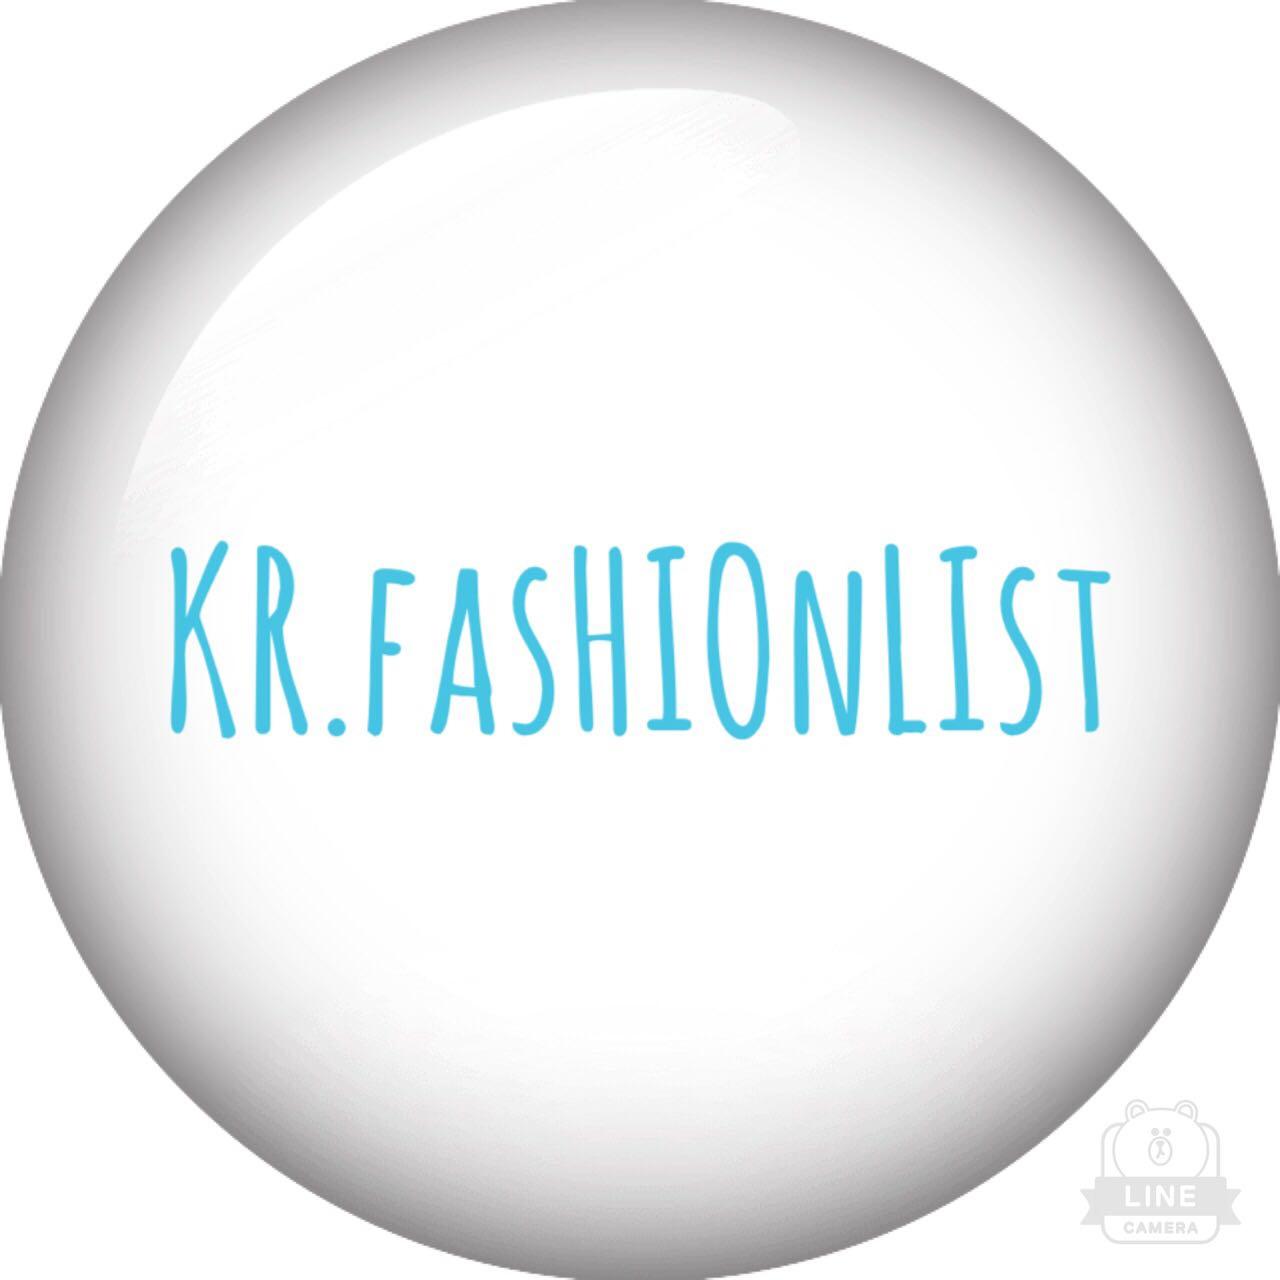 kr.fashionlist